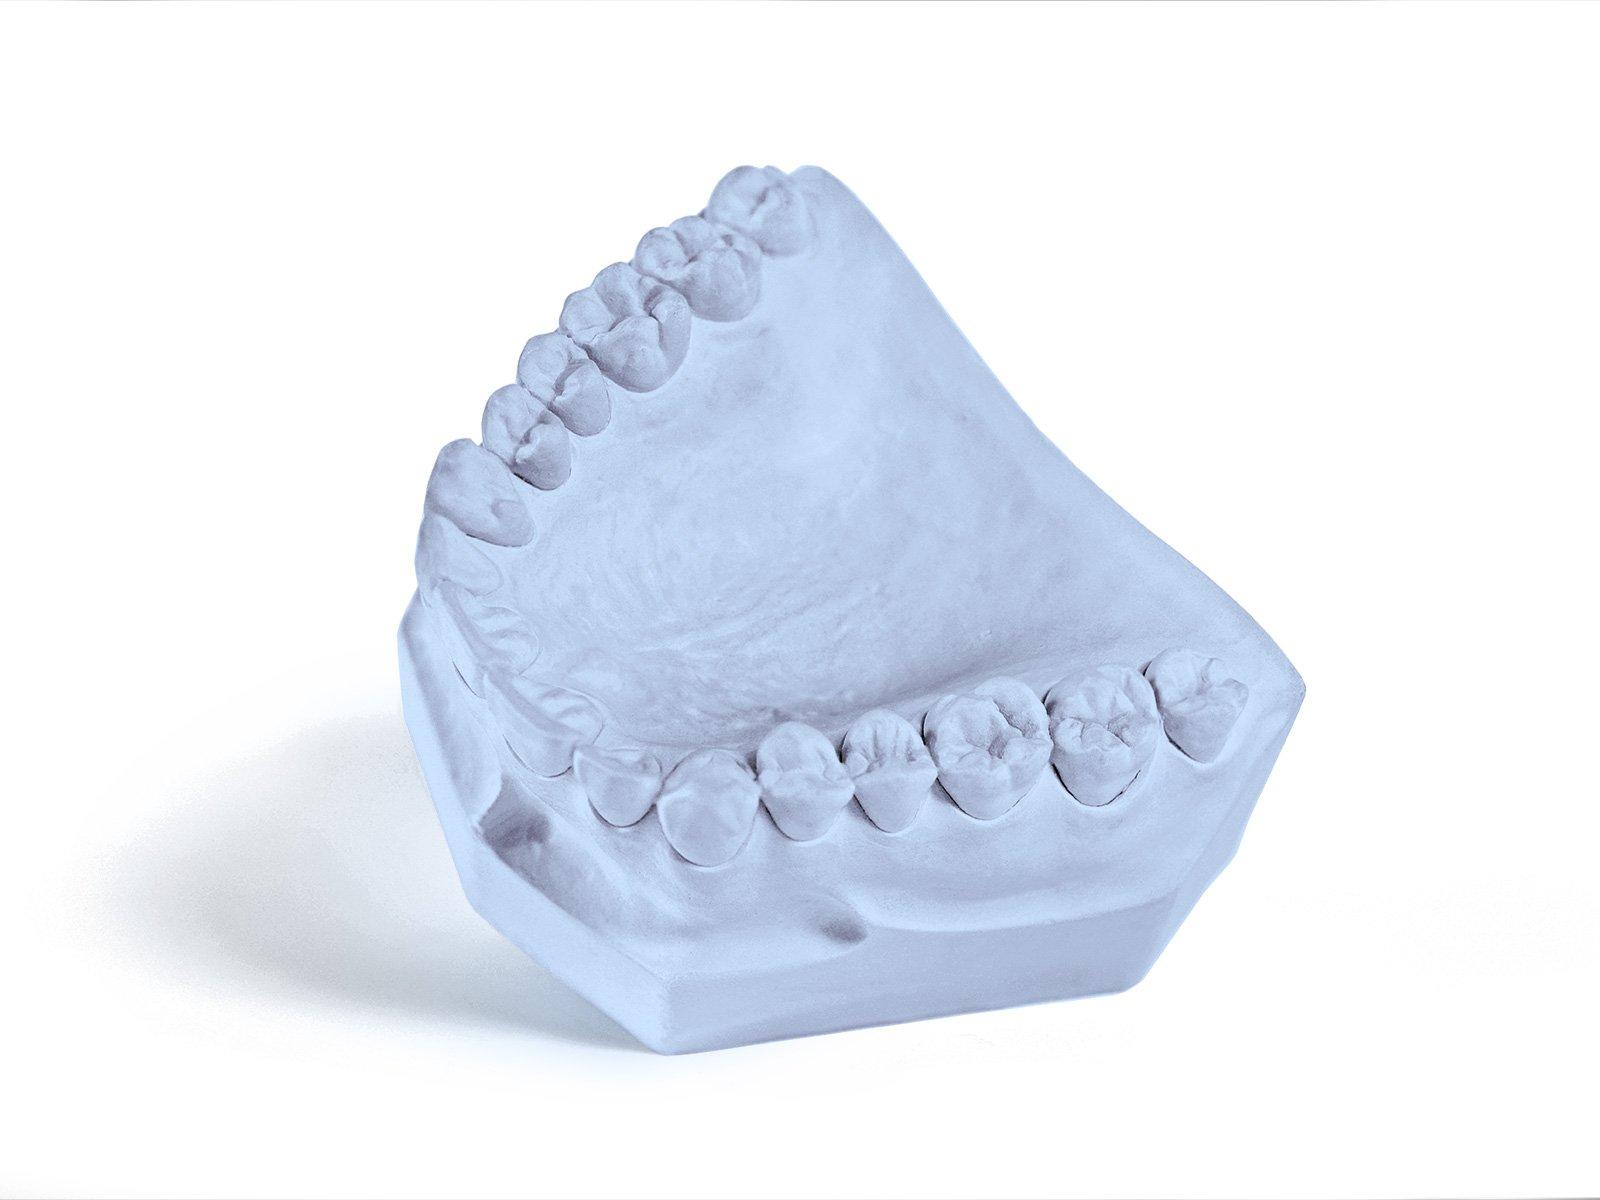 Garreco 1011525 Dental Tecstone, Type III Gypsum Base Stone, 25 lb Carton, Blue